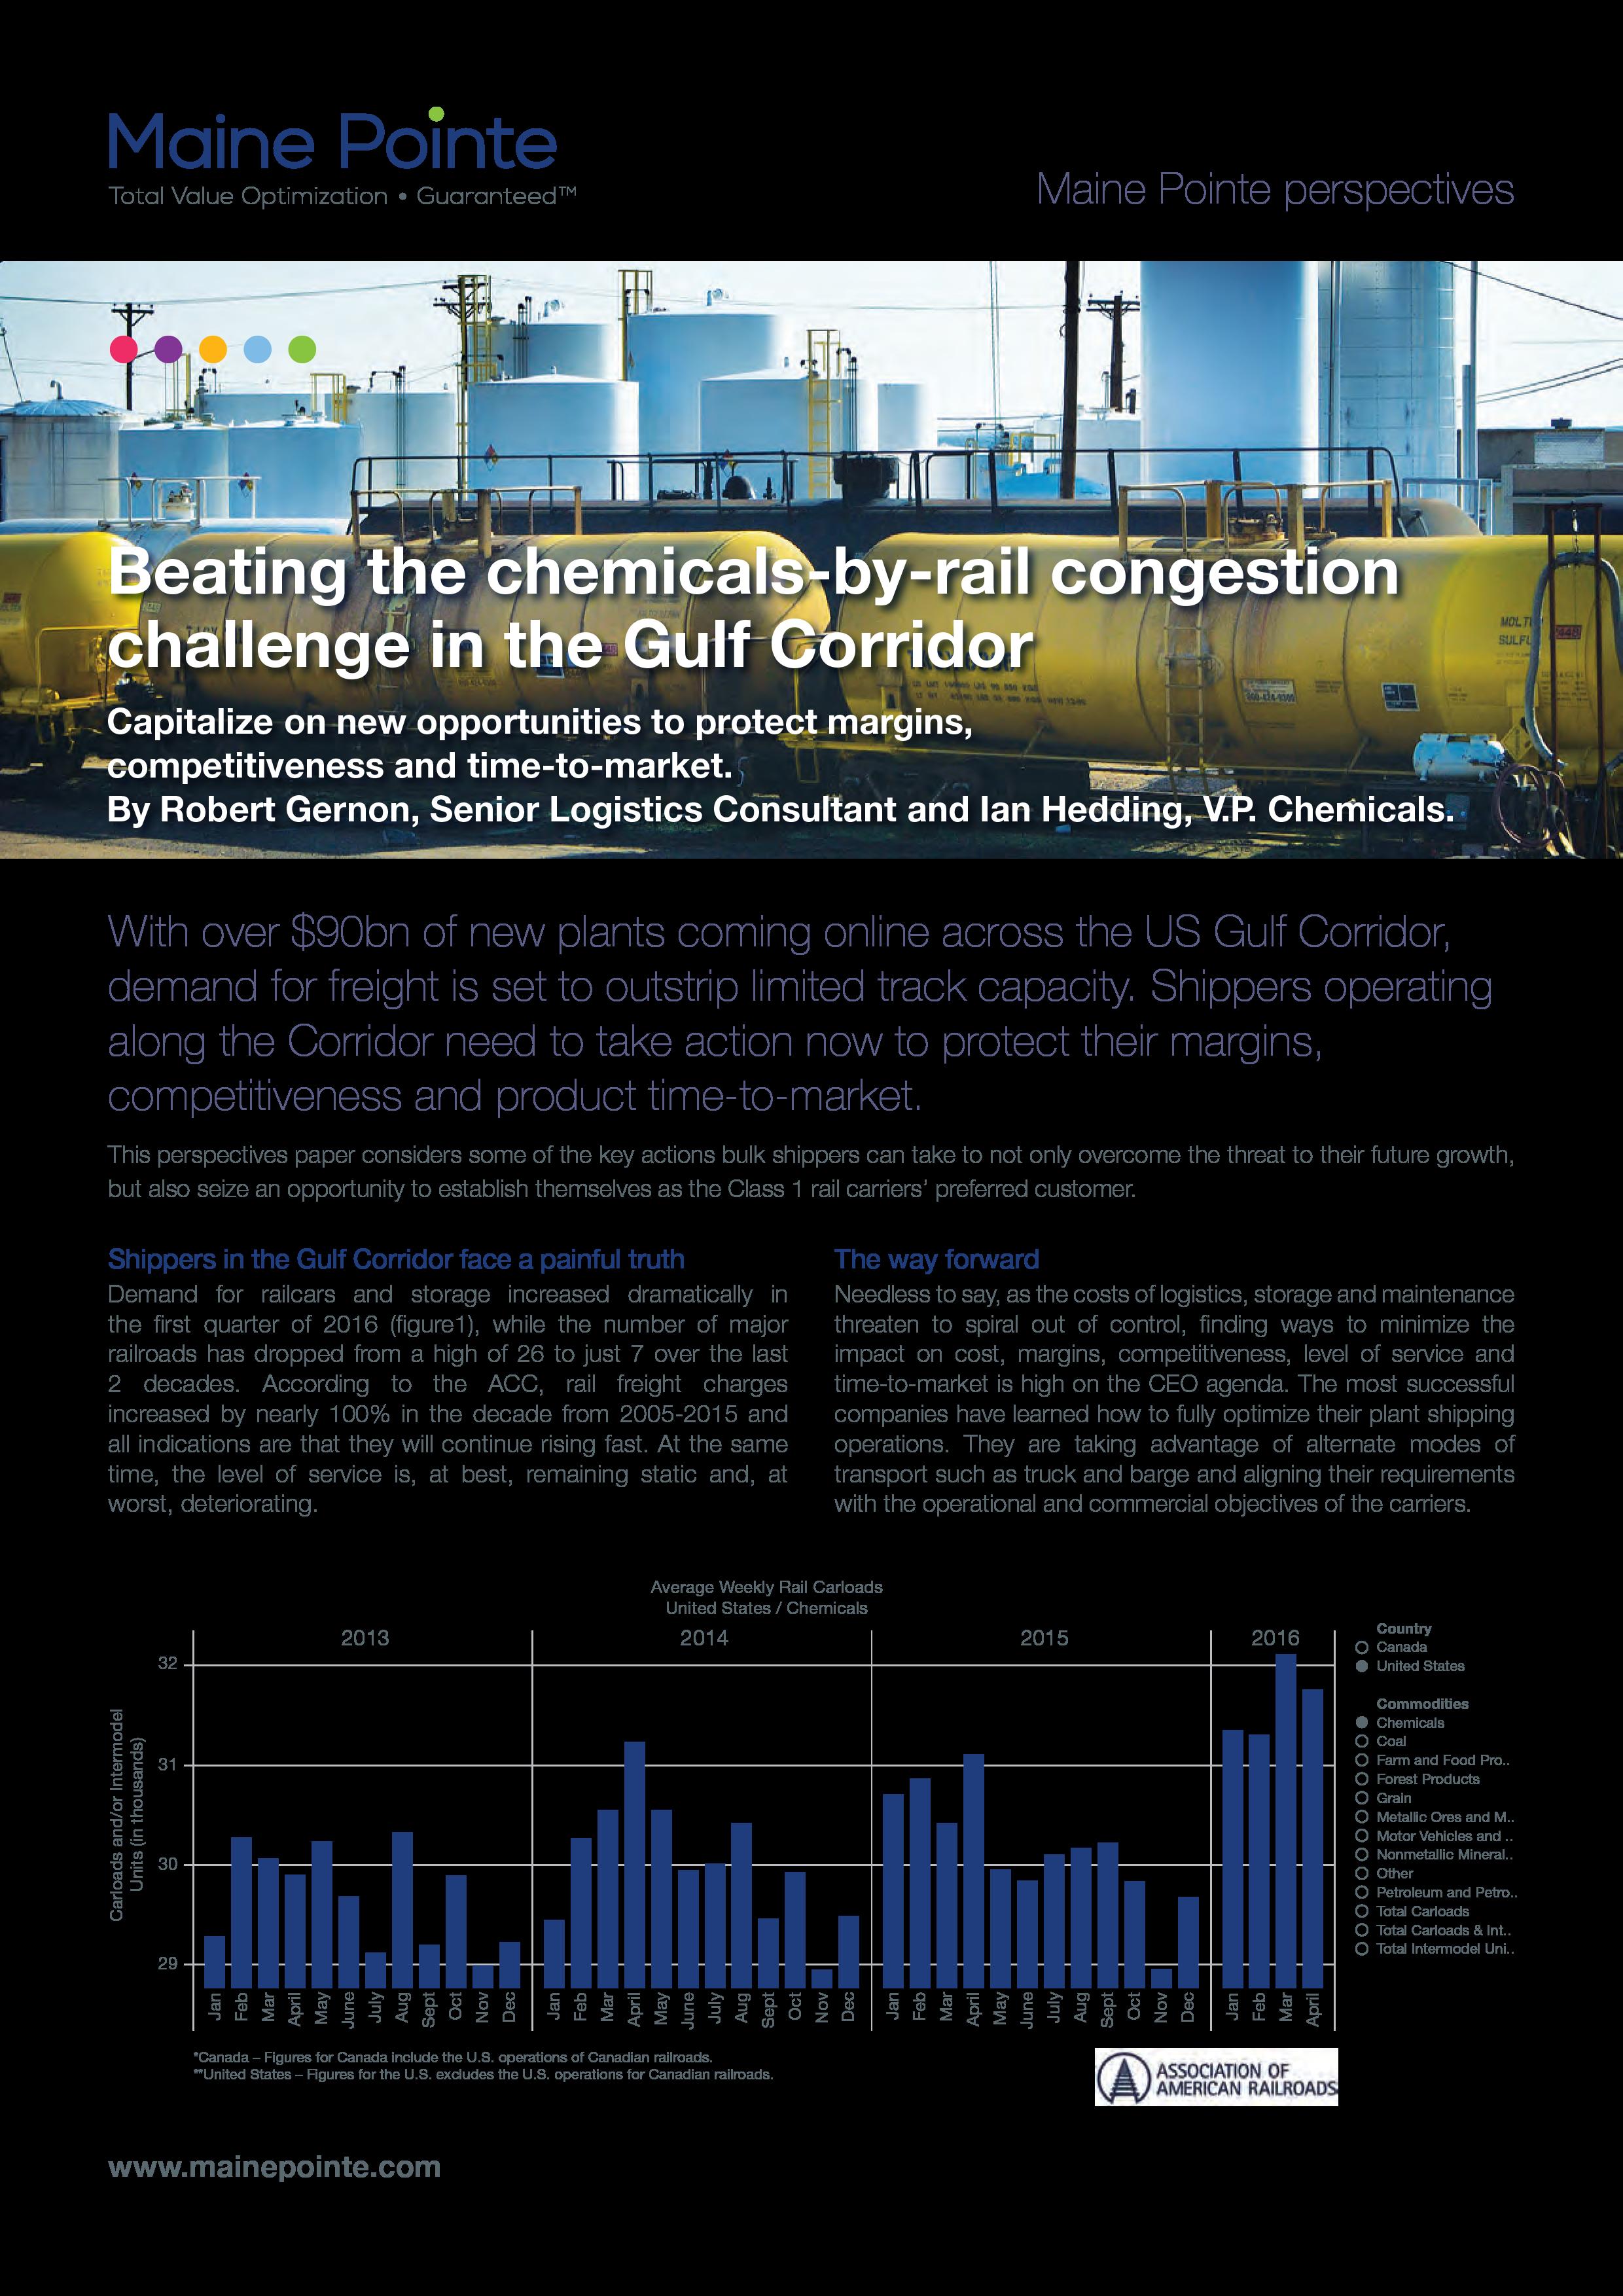 Gulf Corridor Chemicals-by-Rail